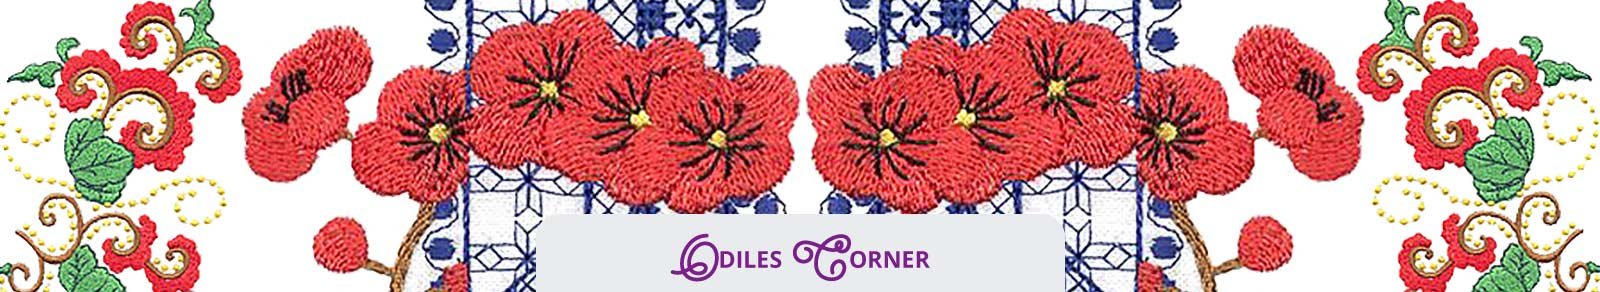 Odiles Corner